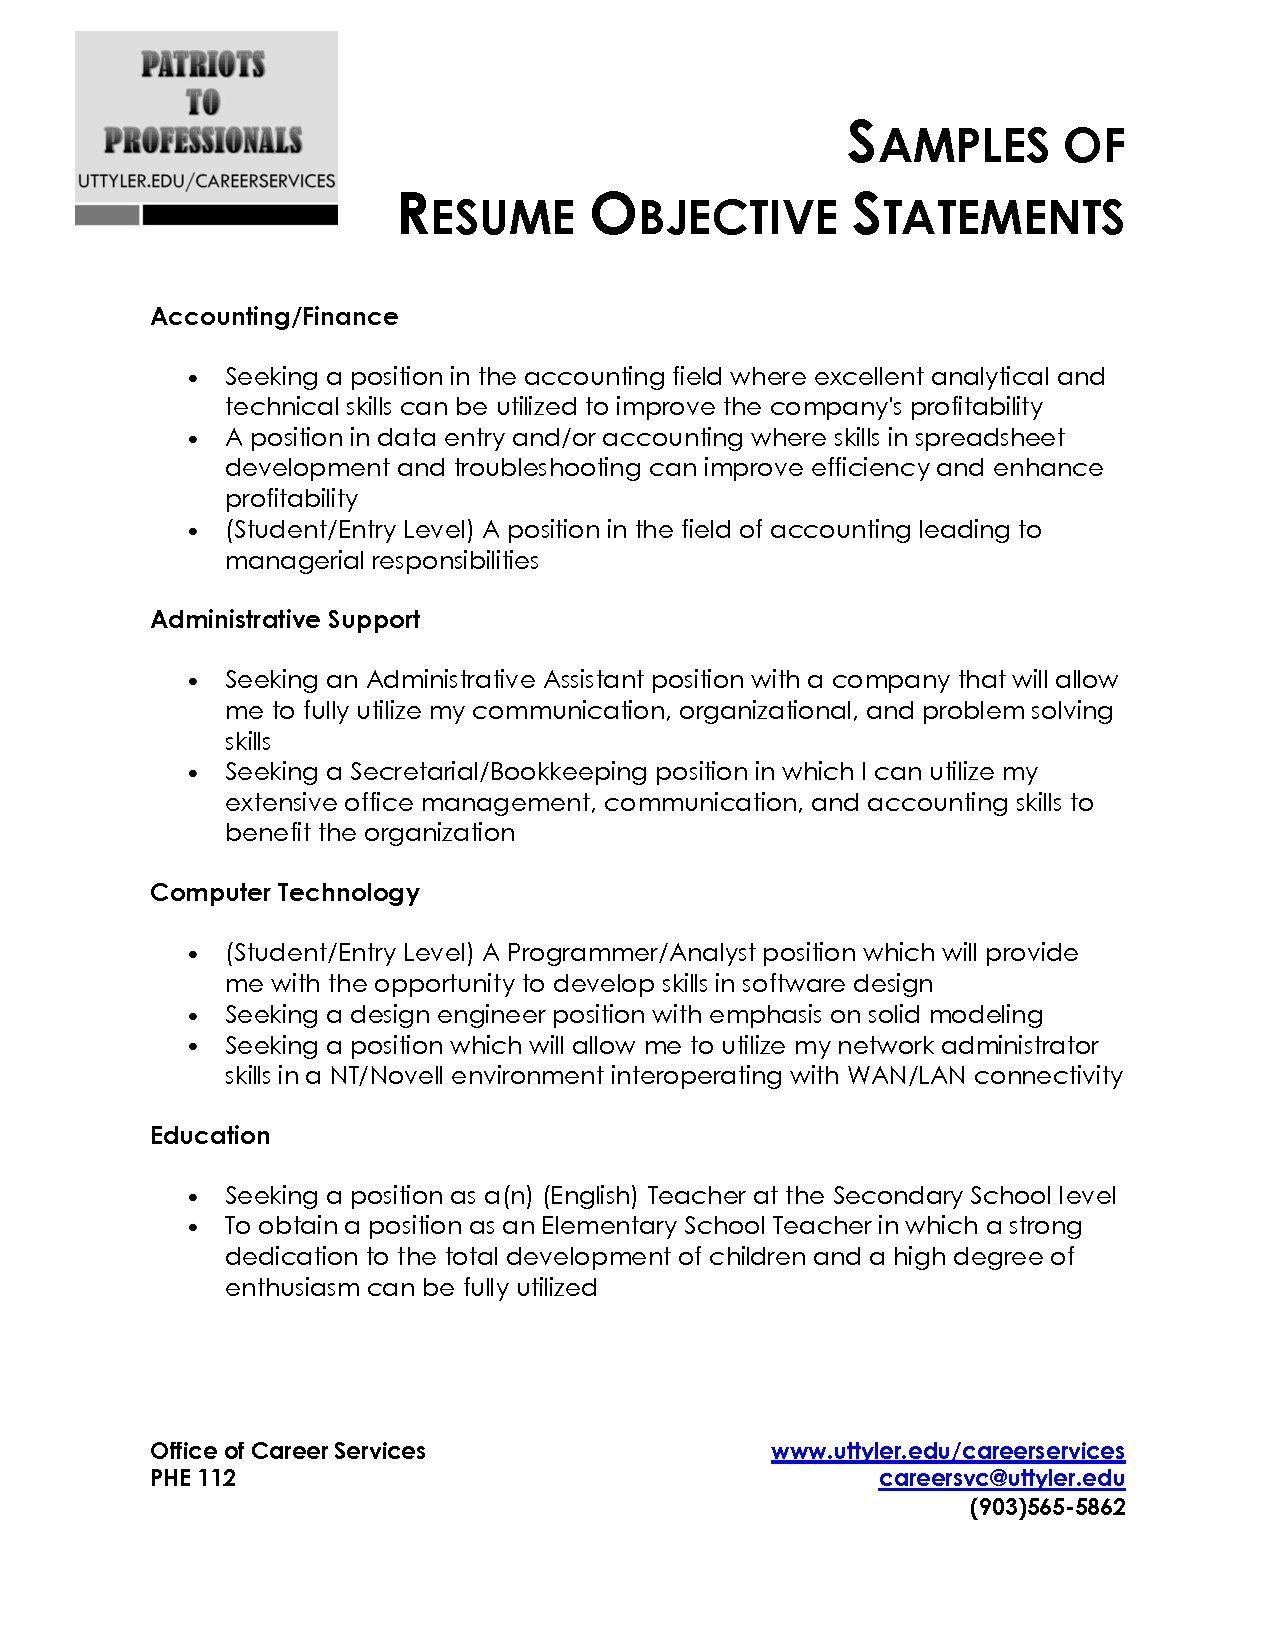 Sample Resume Objective Statement  Free Resume Templates  Resume